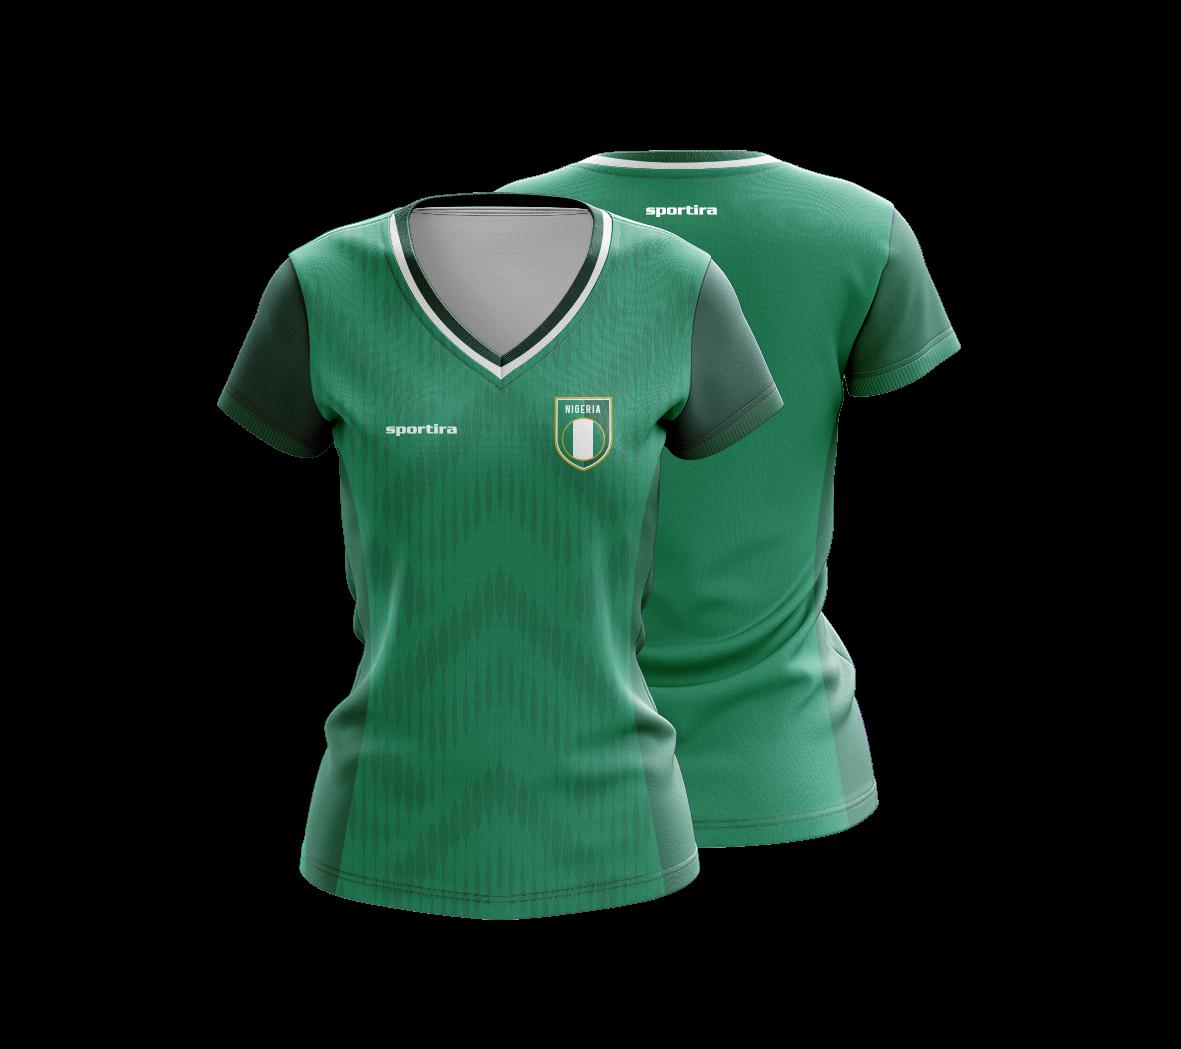 huge discount bfcd5 d2fb0 Nigeria Replica Jersey - Women - Sportira Exclusive Collections